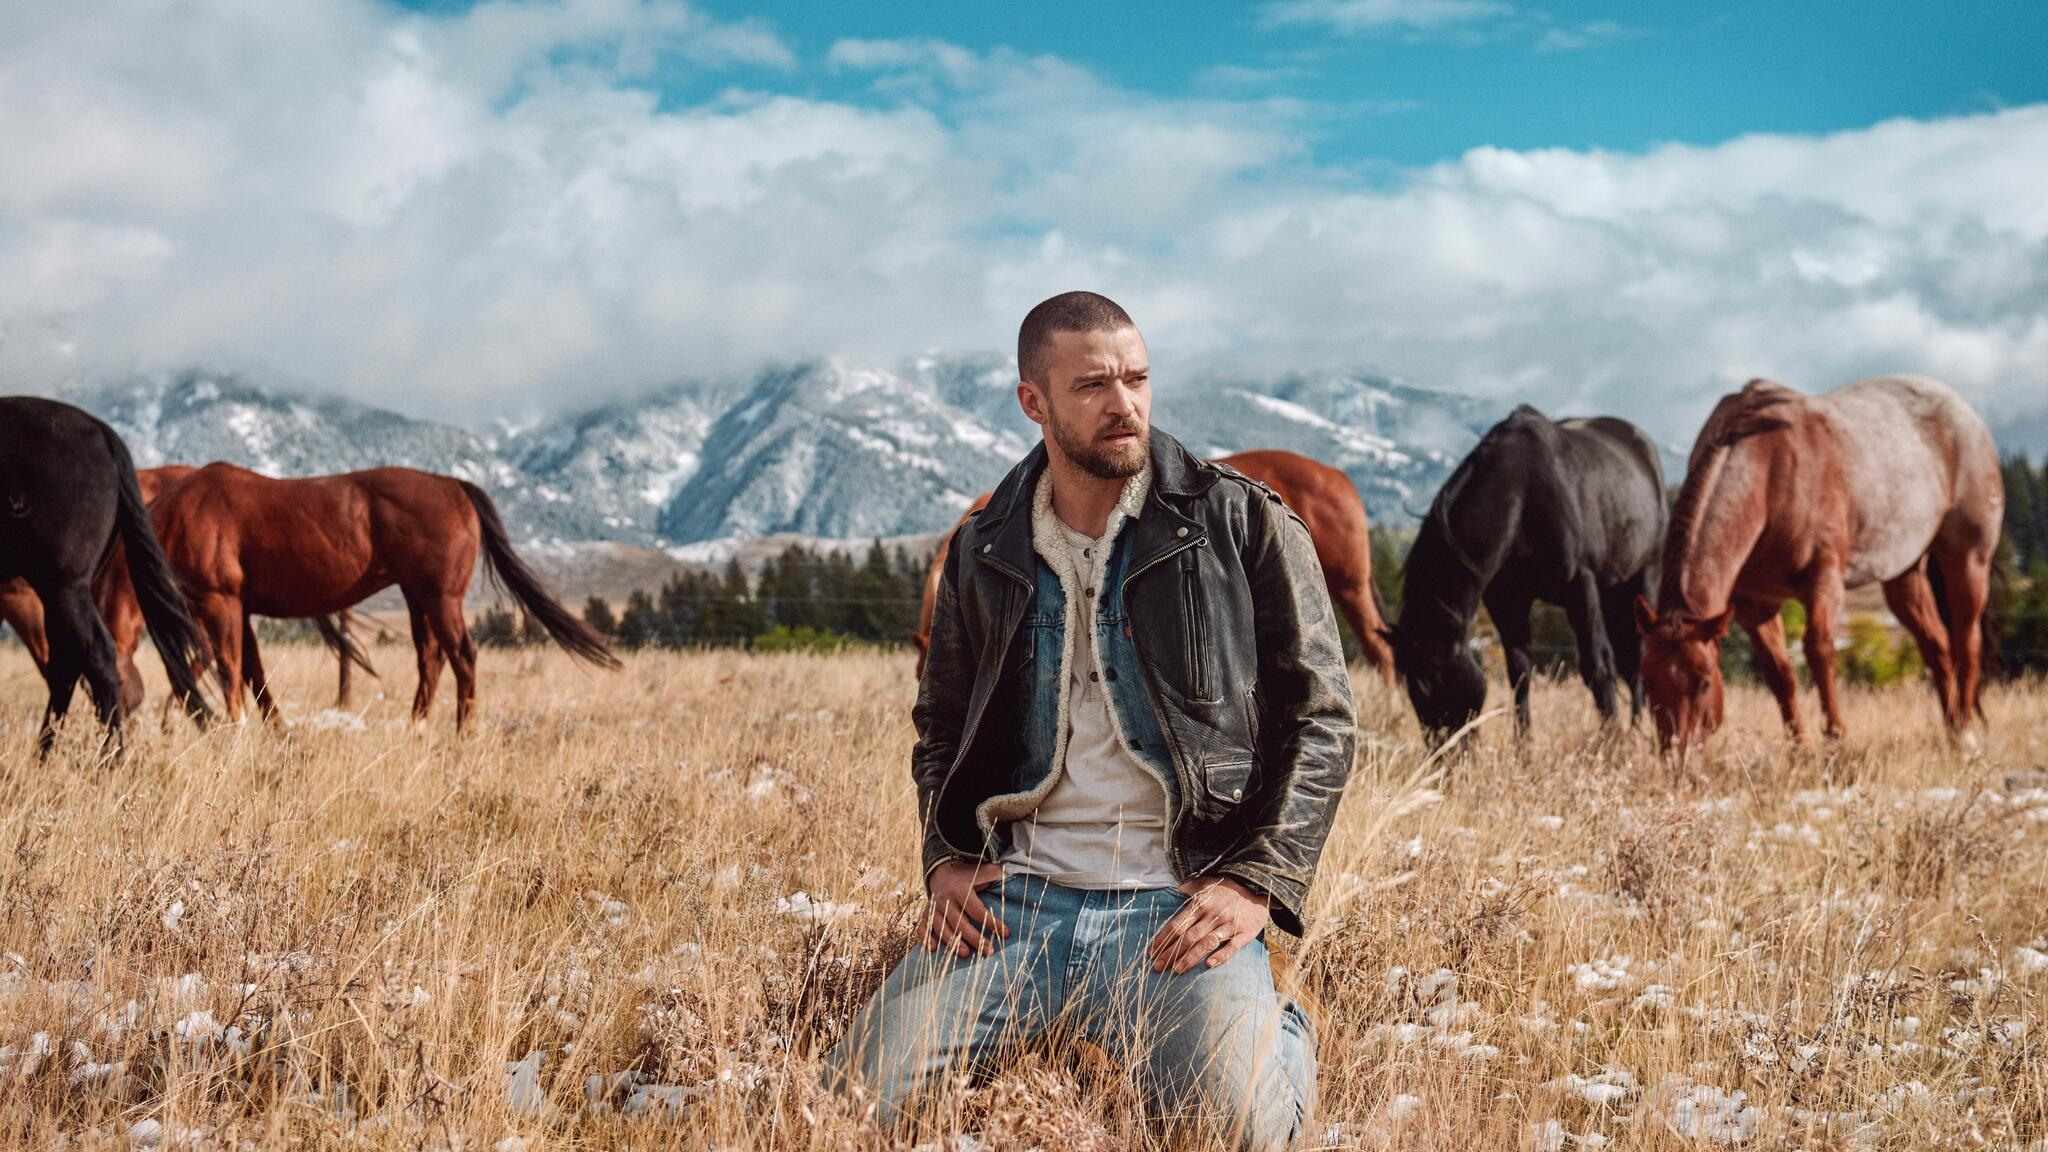 2048x1152 Justin Timberlake 8k 2048x1152 Resolution Hd 4k